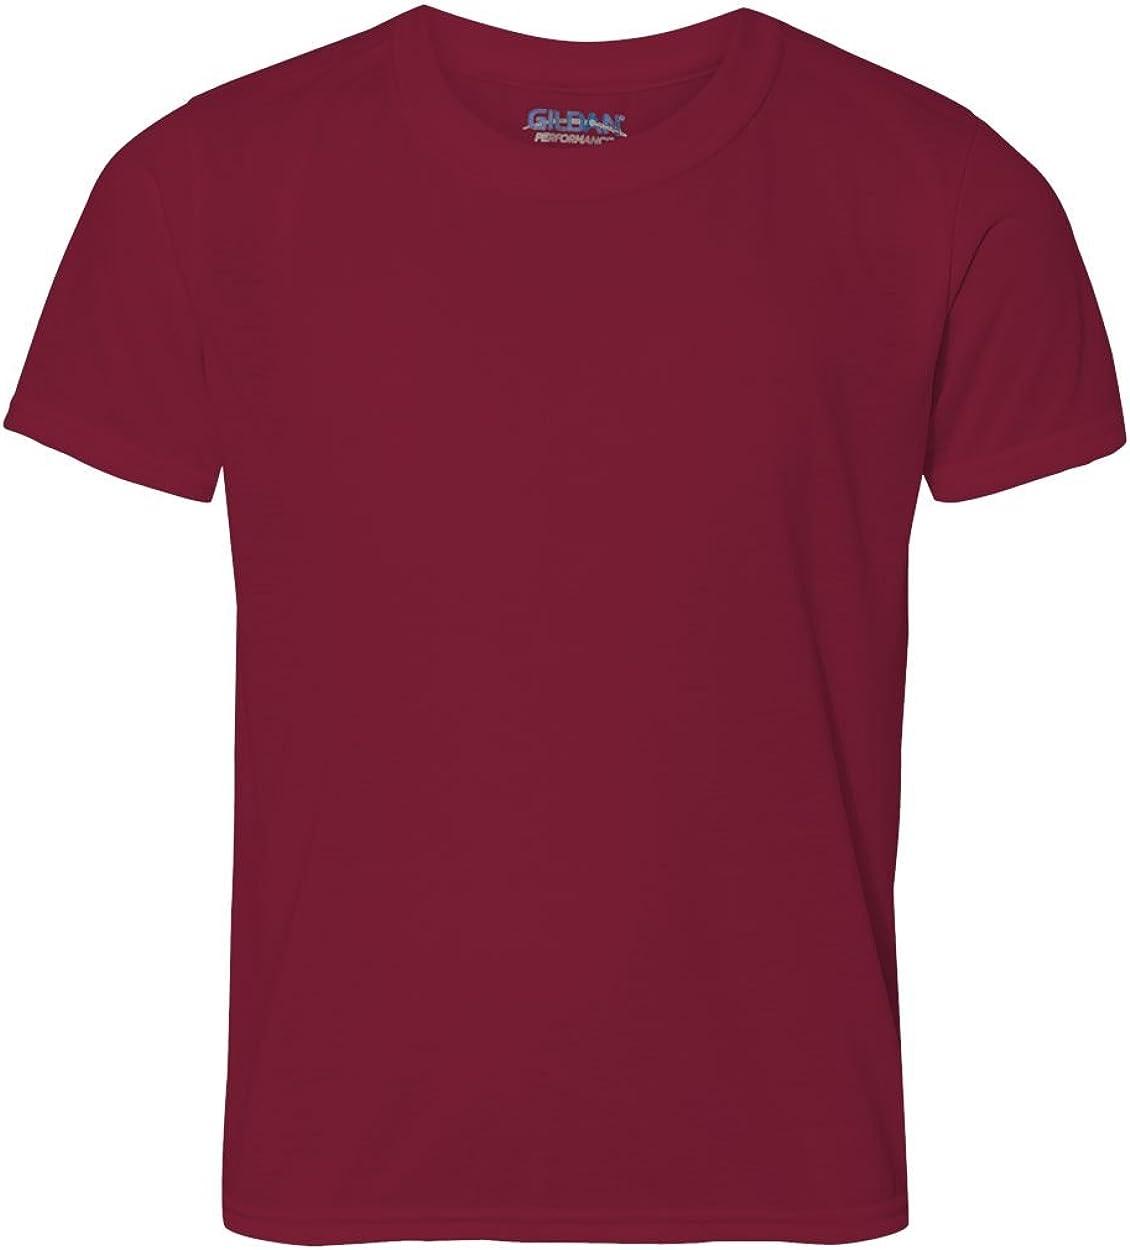 Fashion Gildan 42000B Youth Core Performance T Shirt Cardinal Red Large